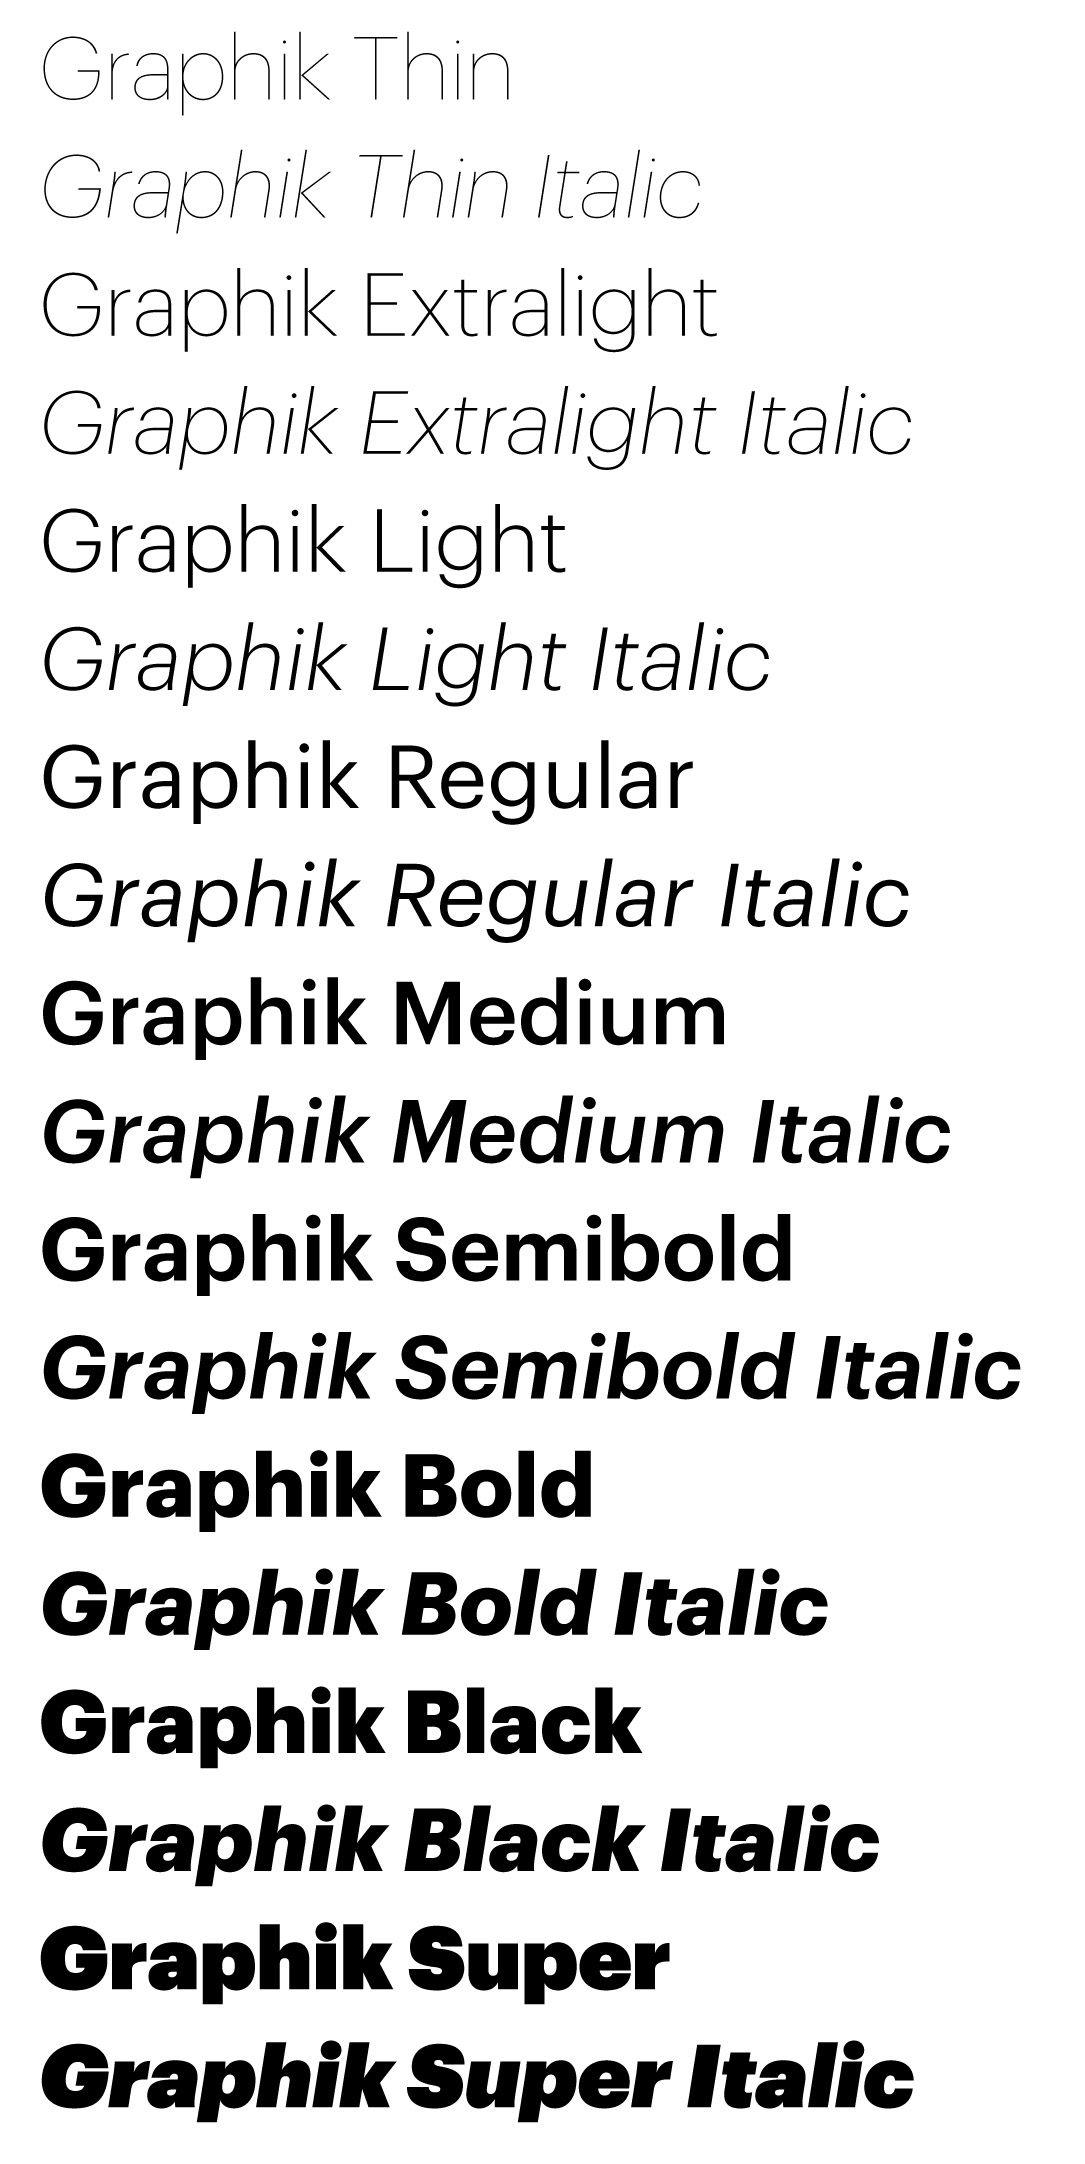 Graphik font | [GD] Font | Typeface font, Typographic design